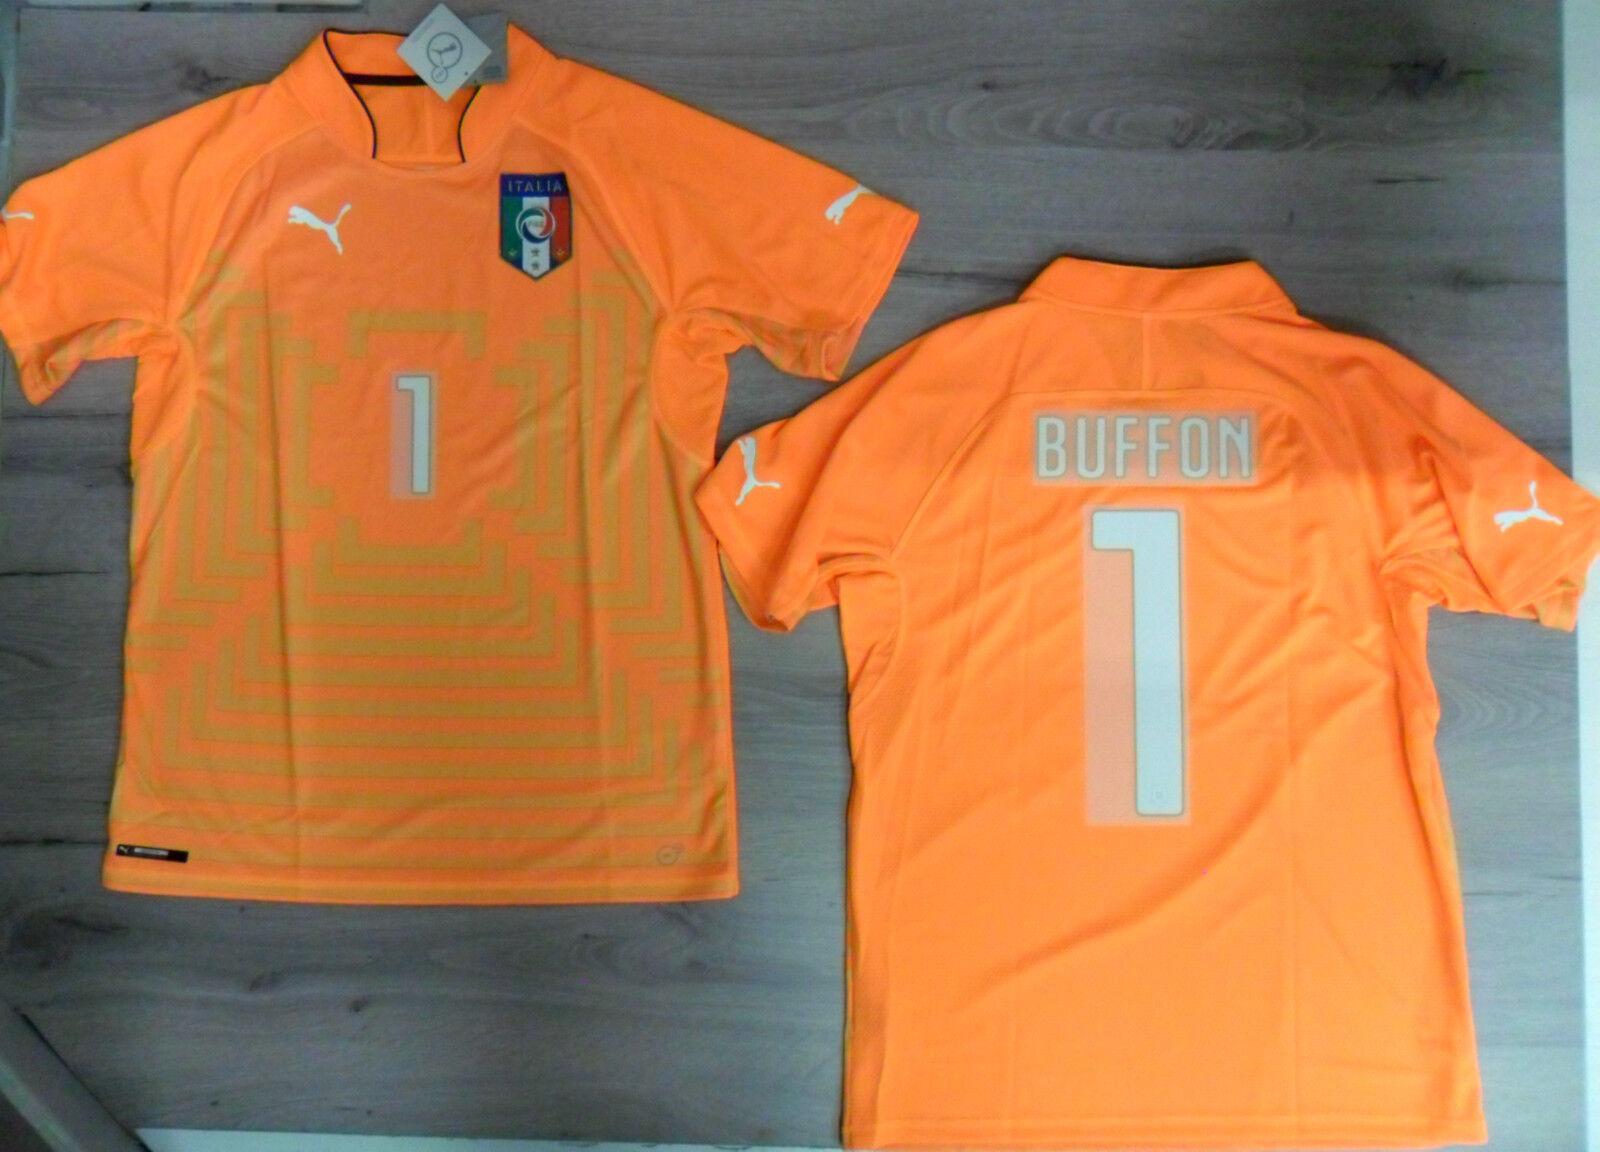 Fw14 Puma XXL Italia 1 Buffon Camiseta Portero Camiseta Mundiales Shirt Jersey O